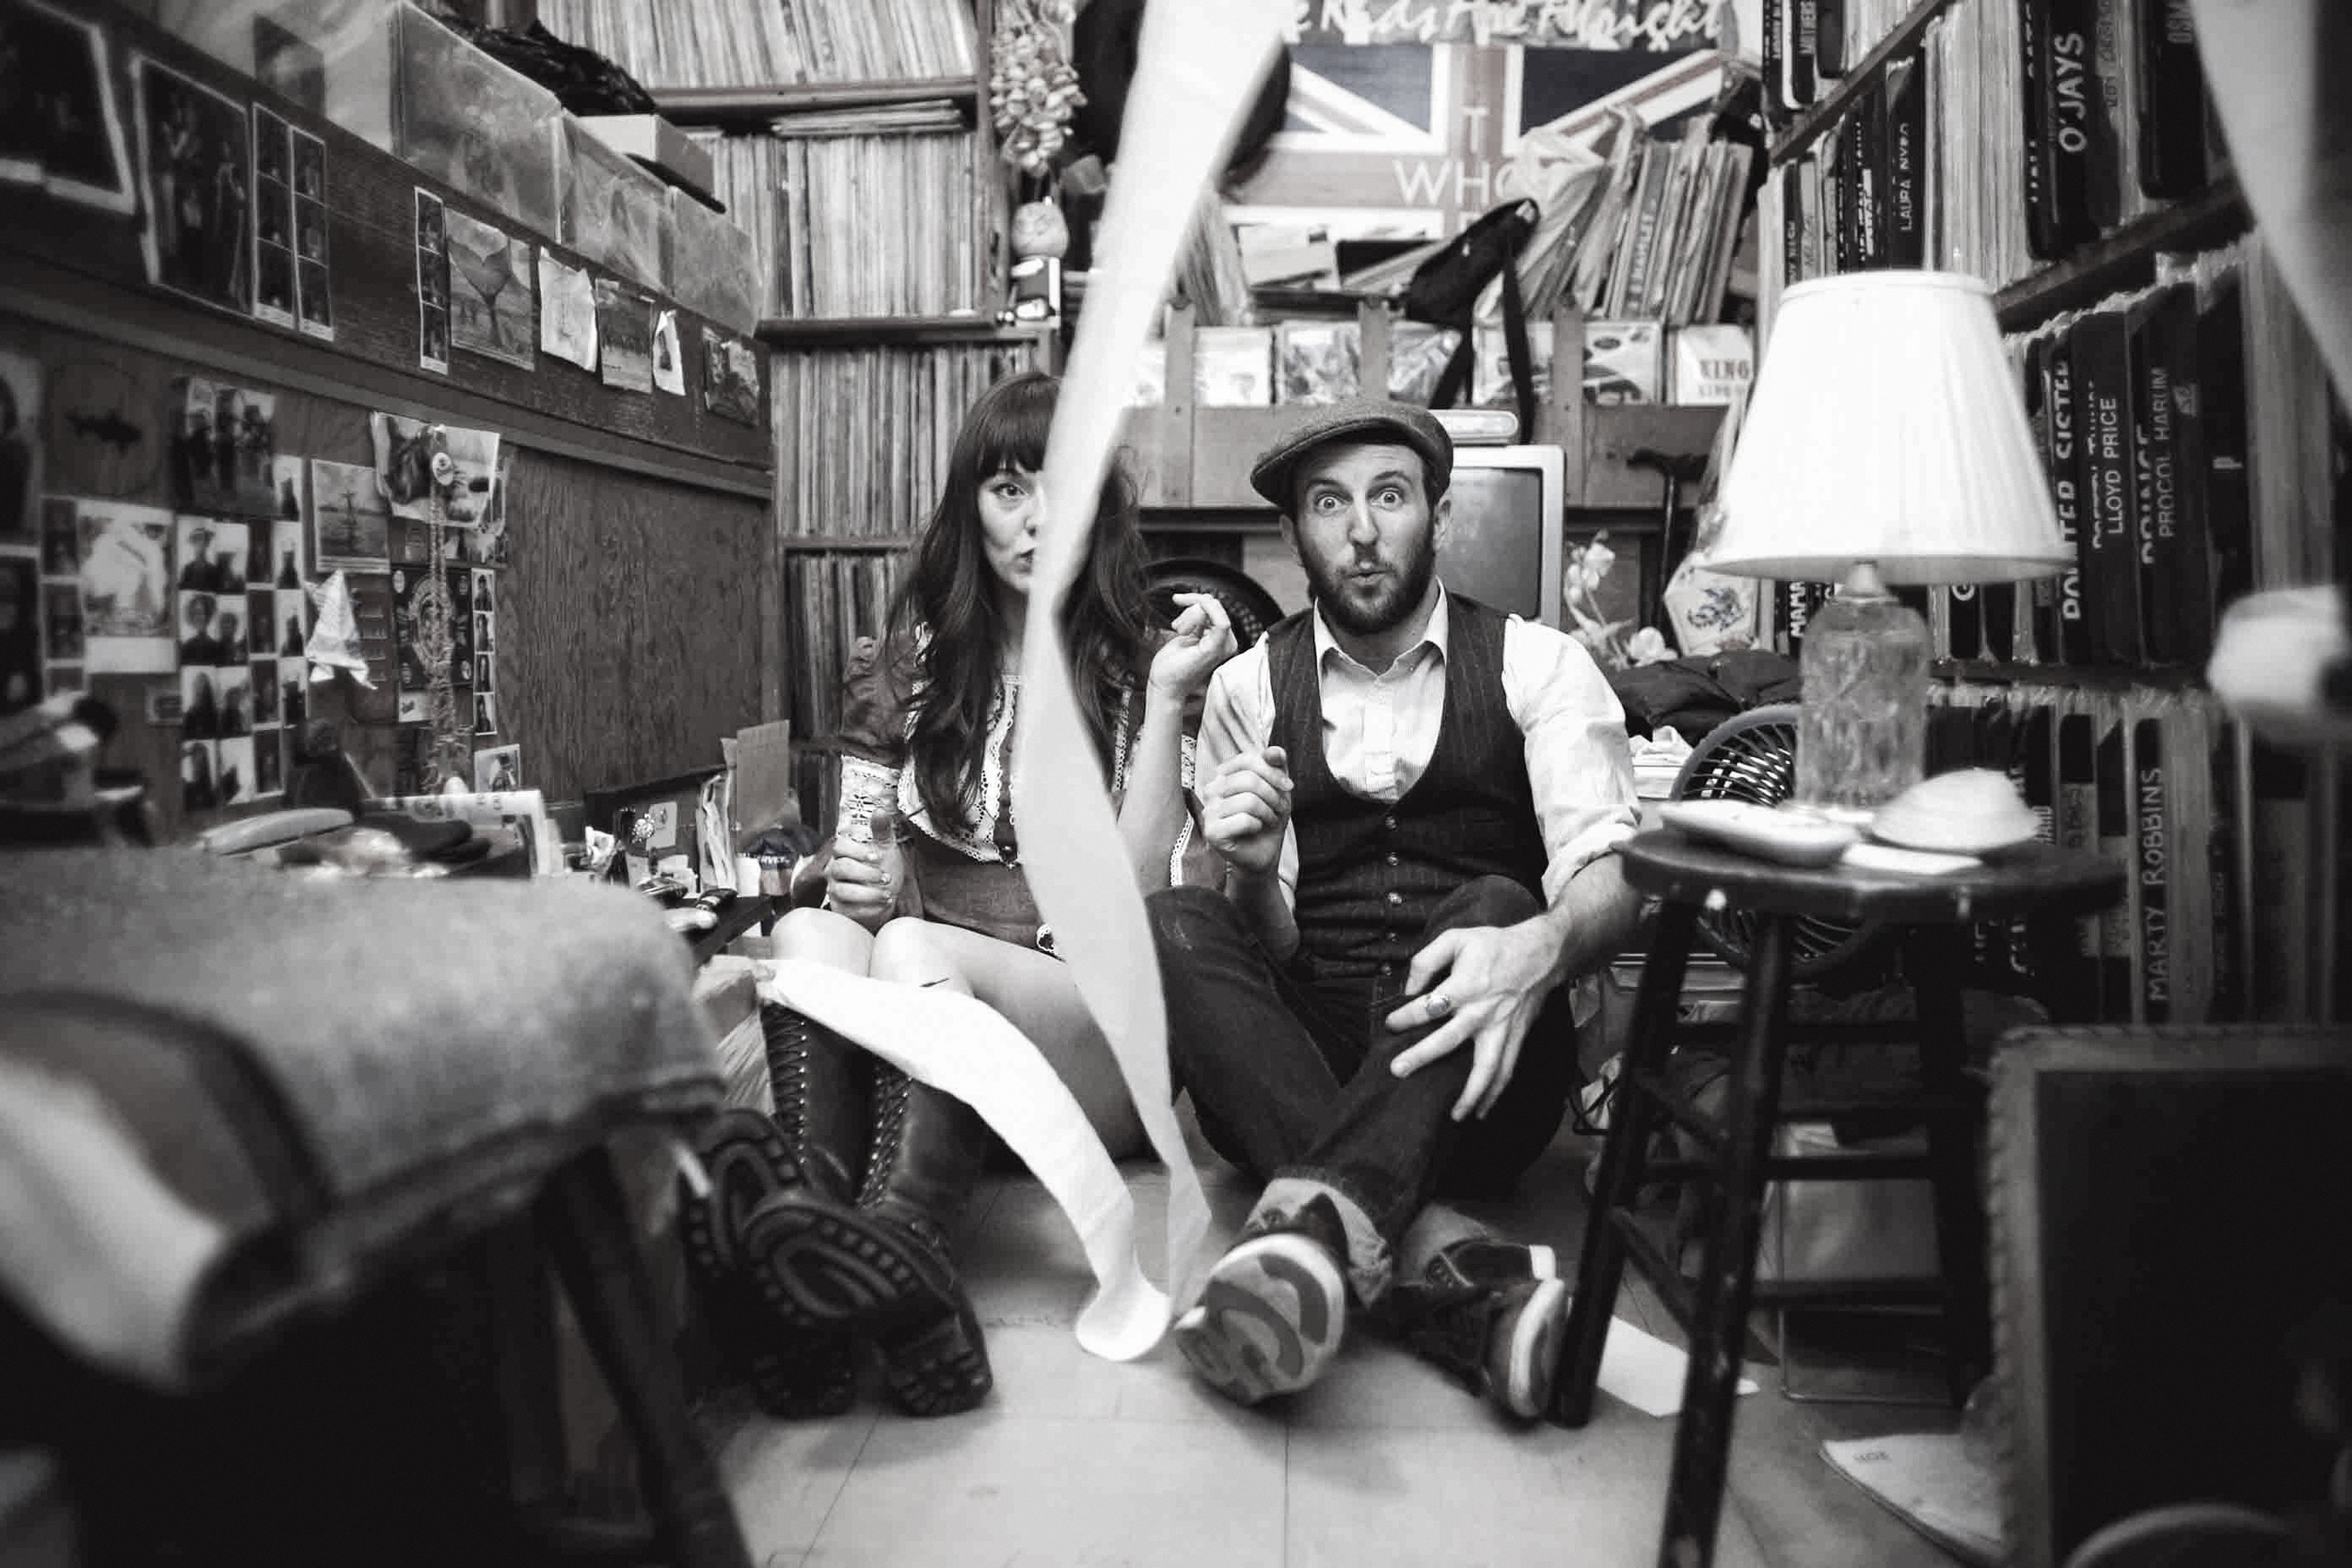 strider records west village record store day vinyl doo wop chellise michael photography rijard-107.jpg